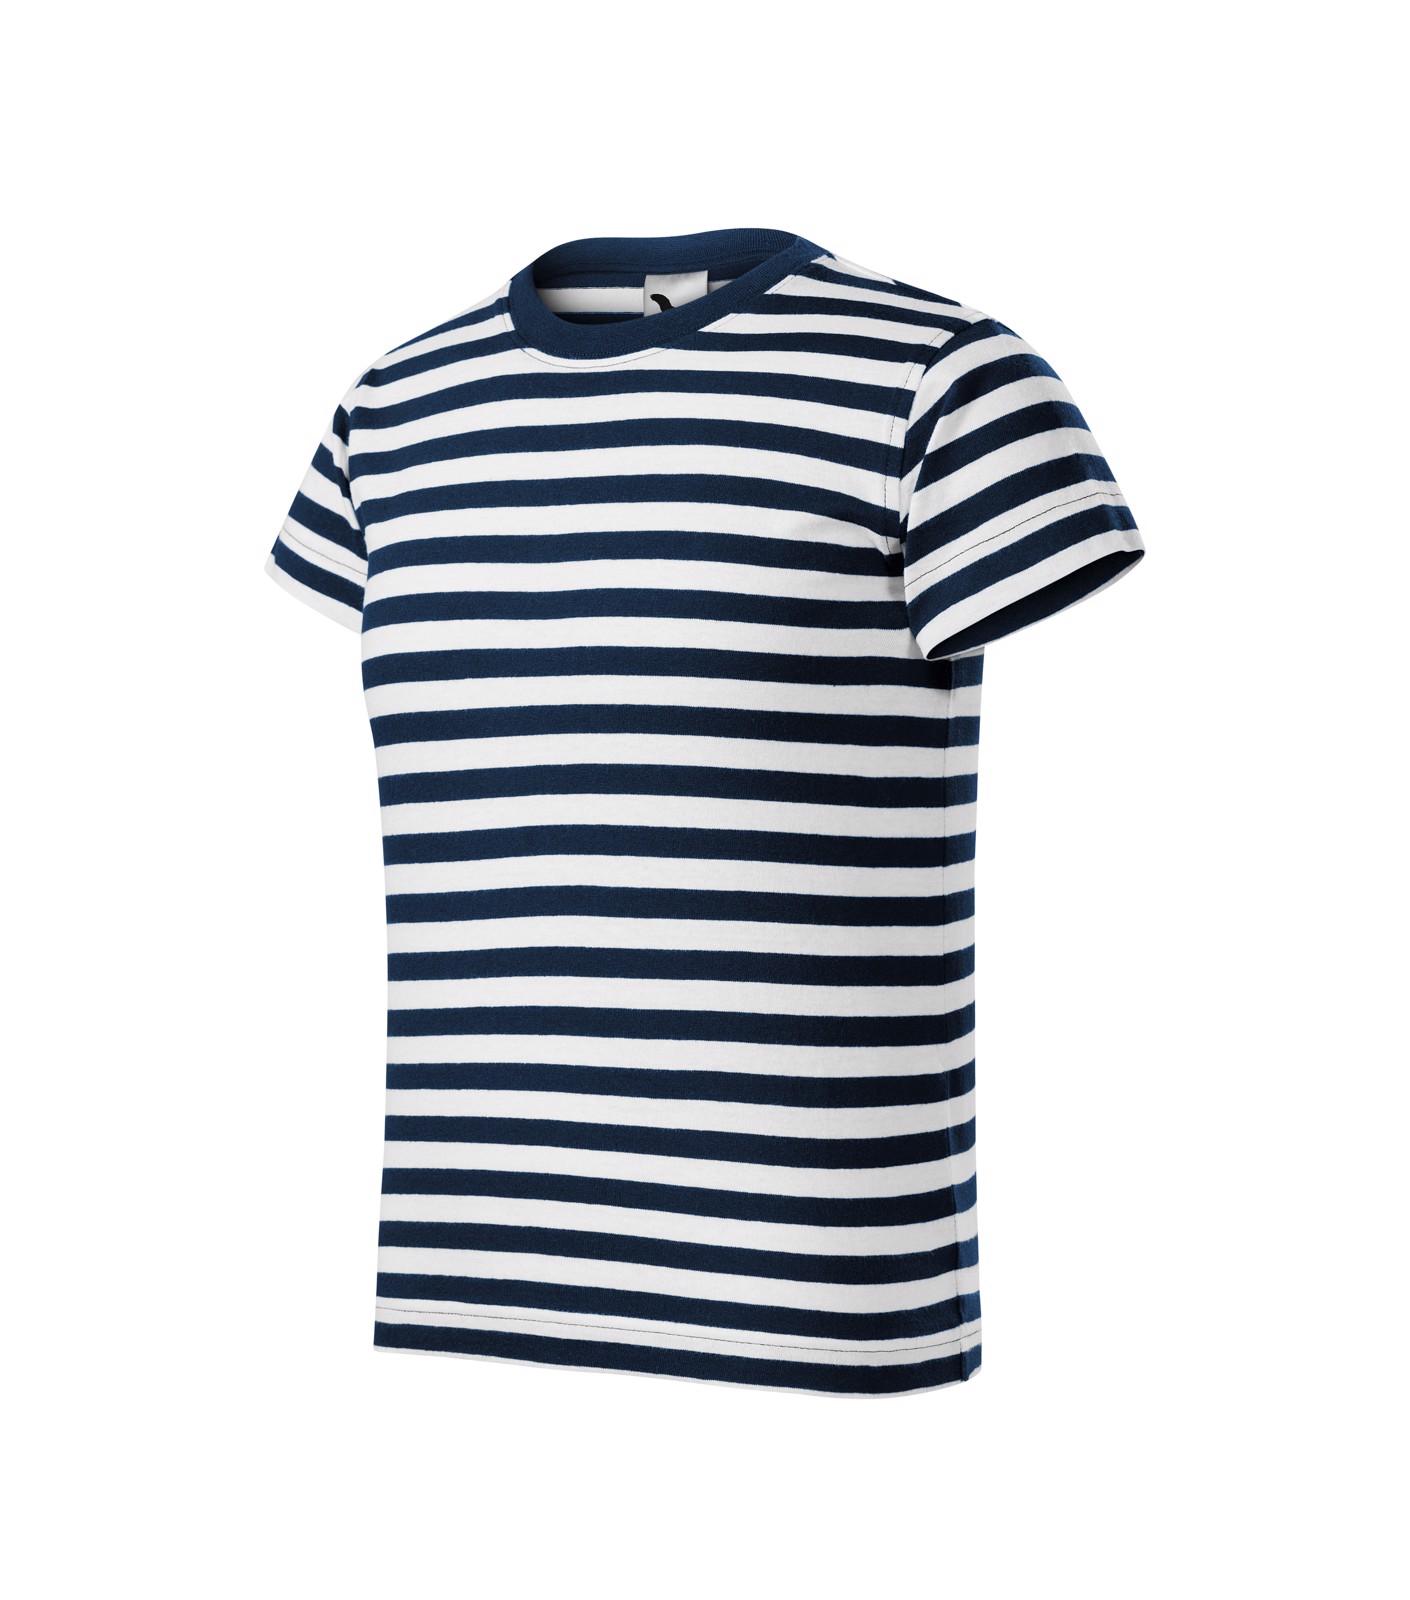 T-shirt Kids Malfini Sailor - Navy Blue / 4 years